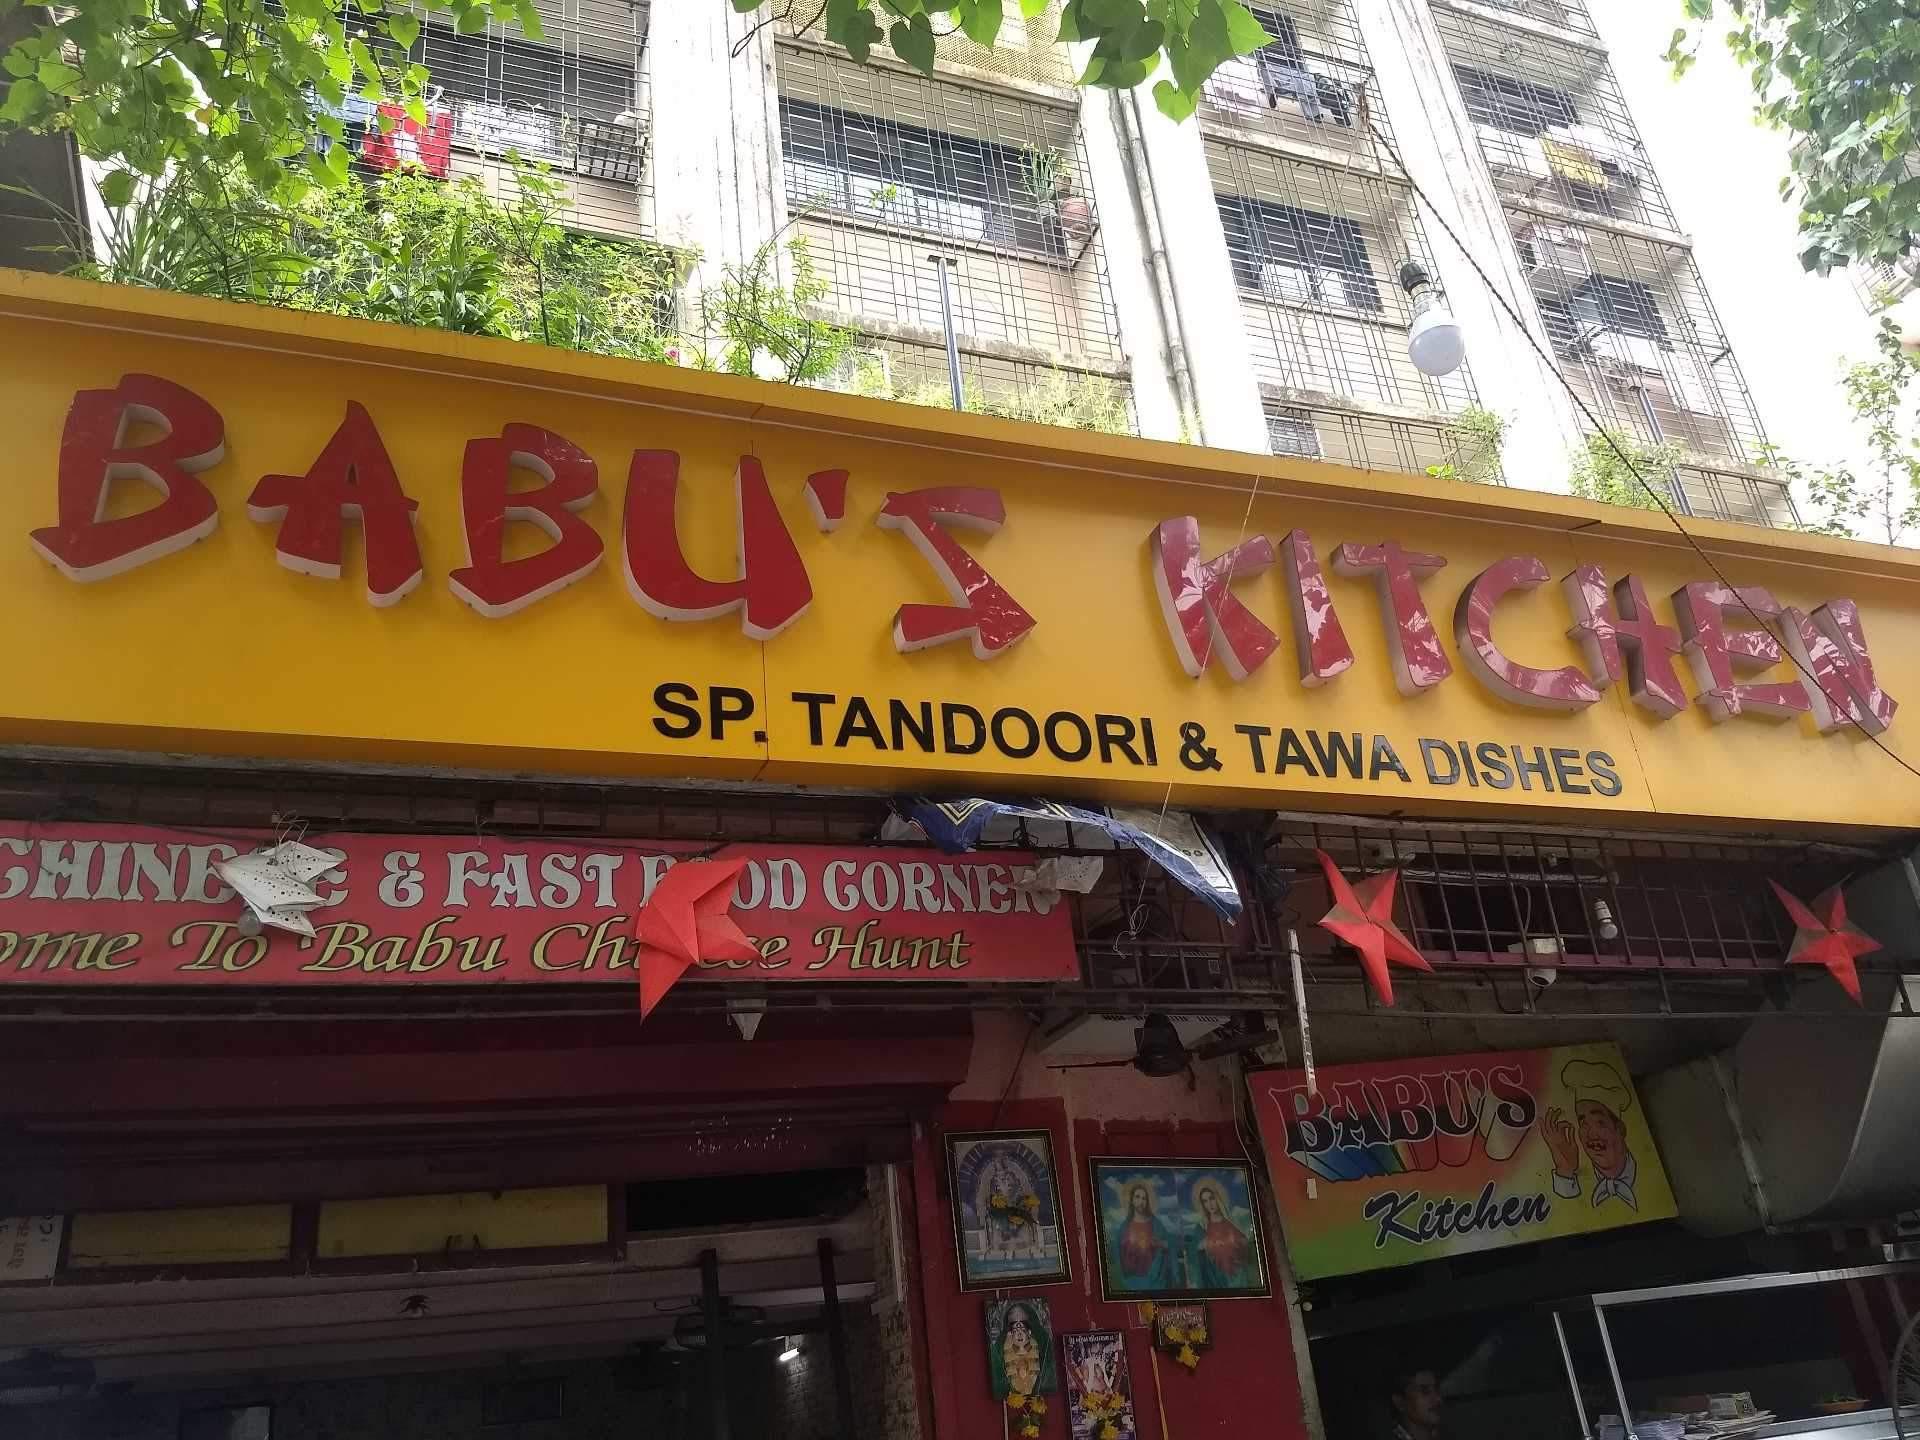 Babus Kitchen Dahisar Mumbai Chinese Street Food Cuisine Restaurant Justdial